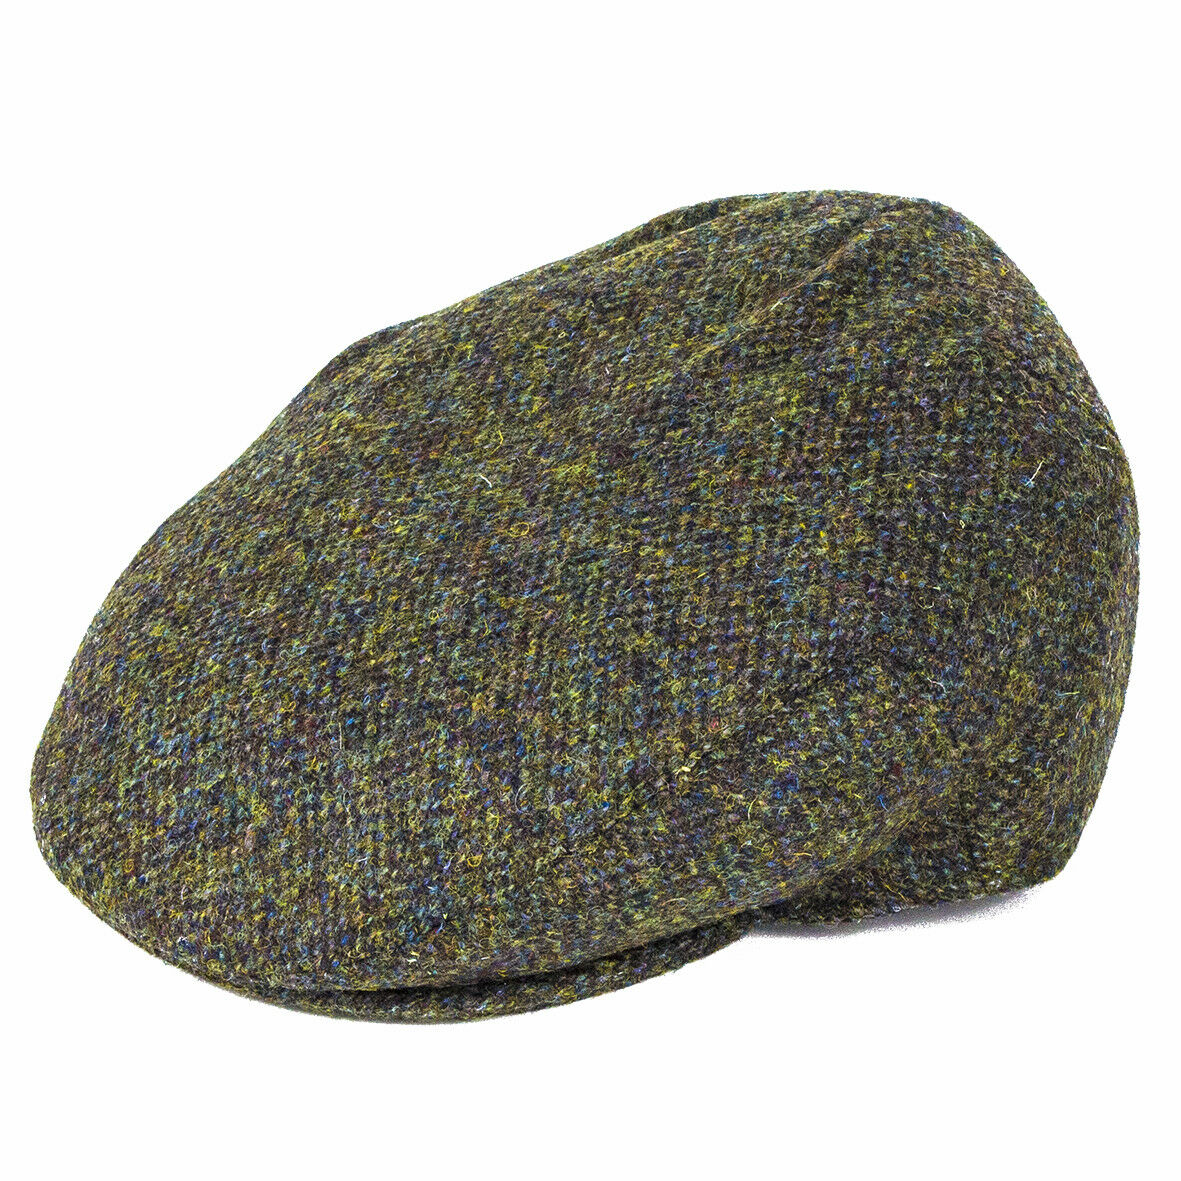 Failsworth Failsworth Failsworth Hats Stornoway Harris Tweed Flat Cap - Grün Mix | Stilvoll und lustig  cff538